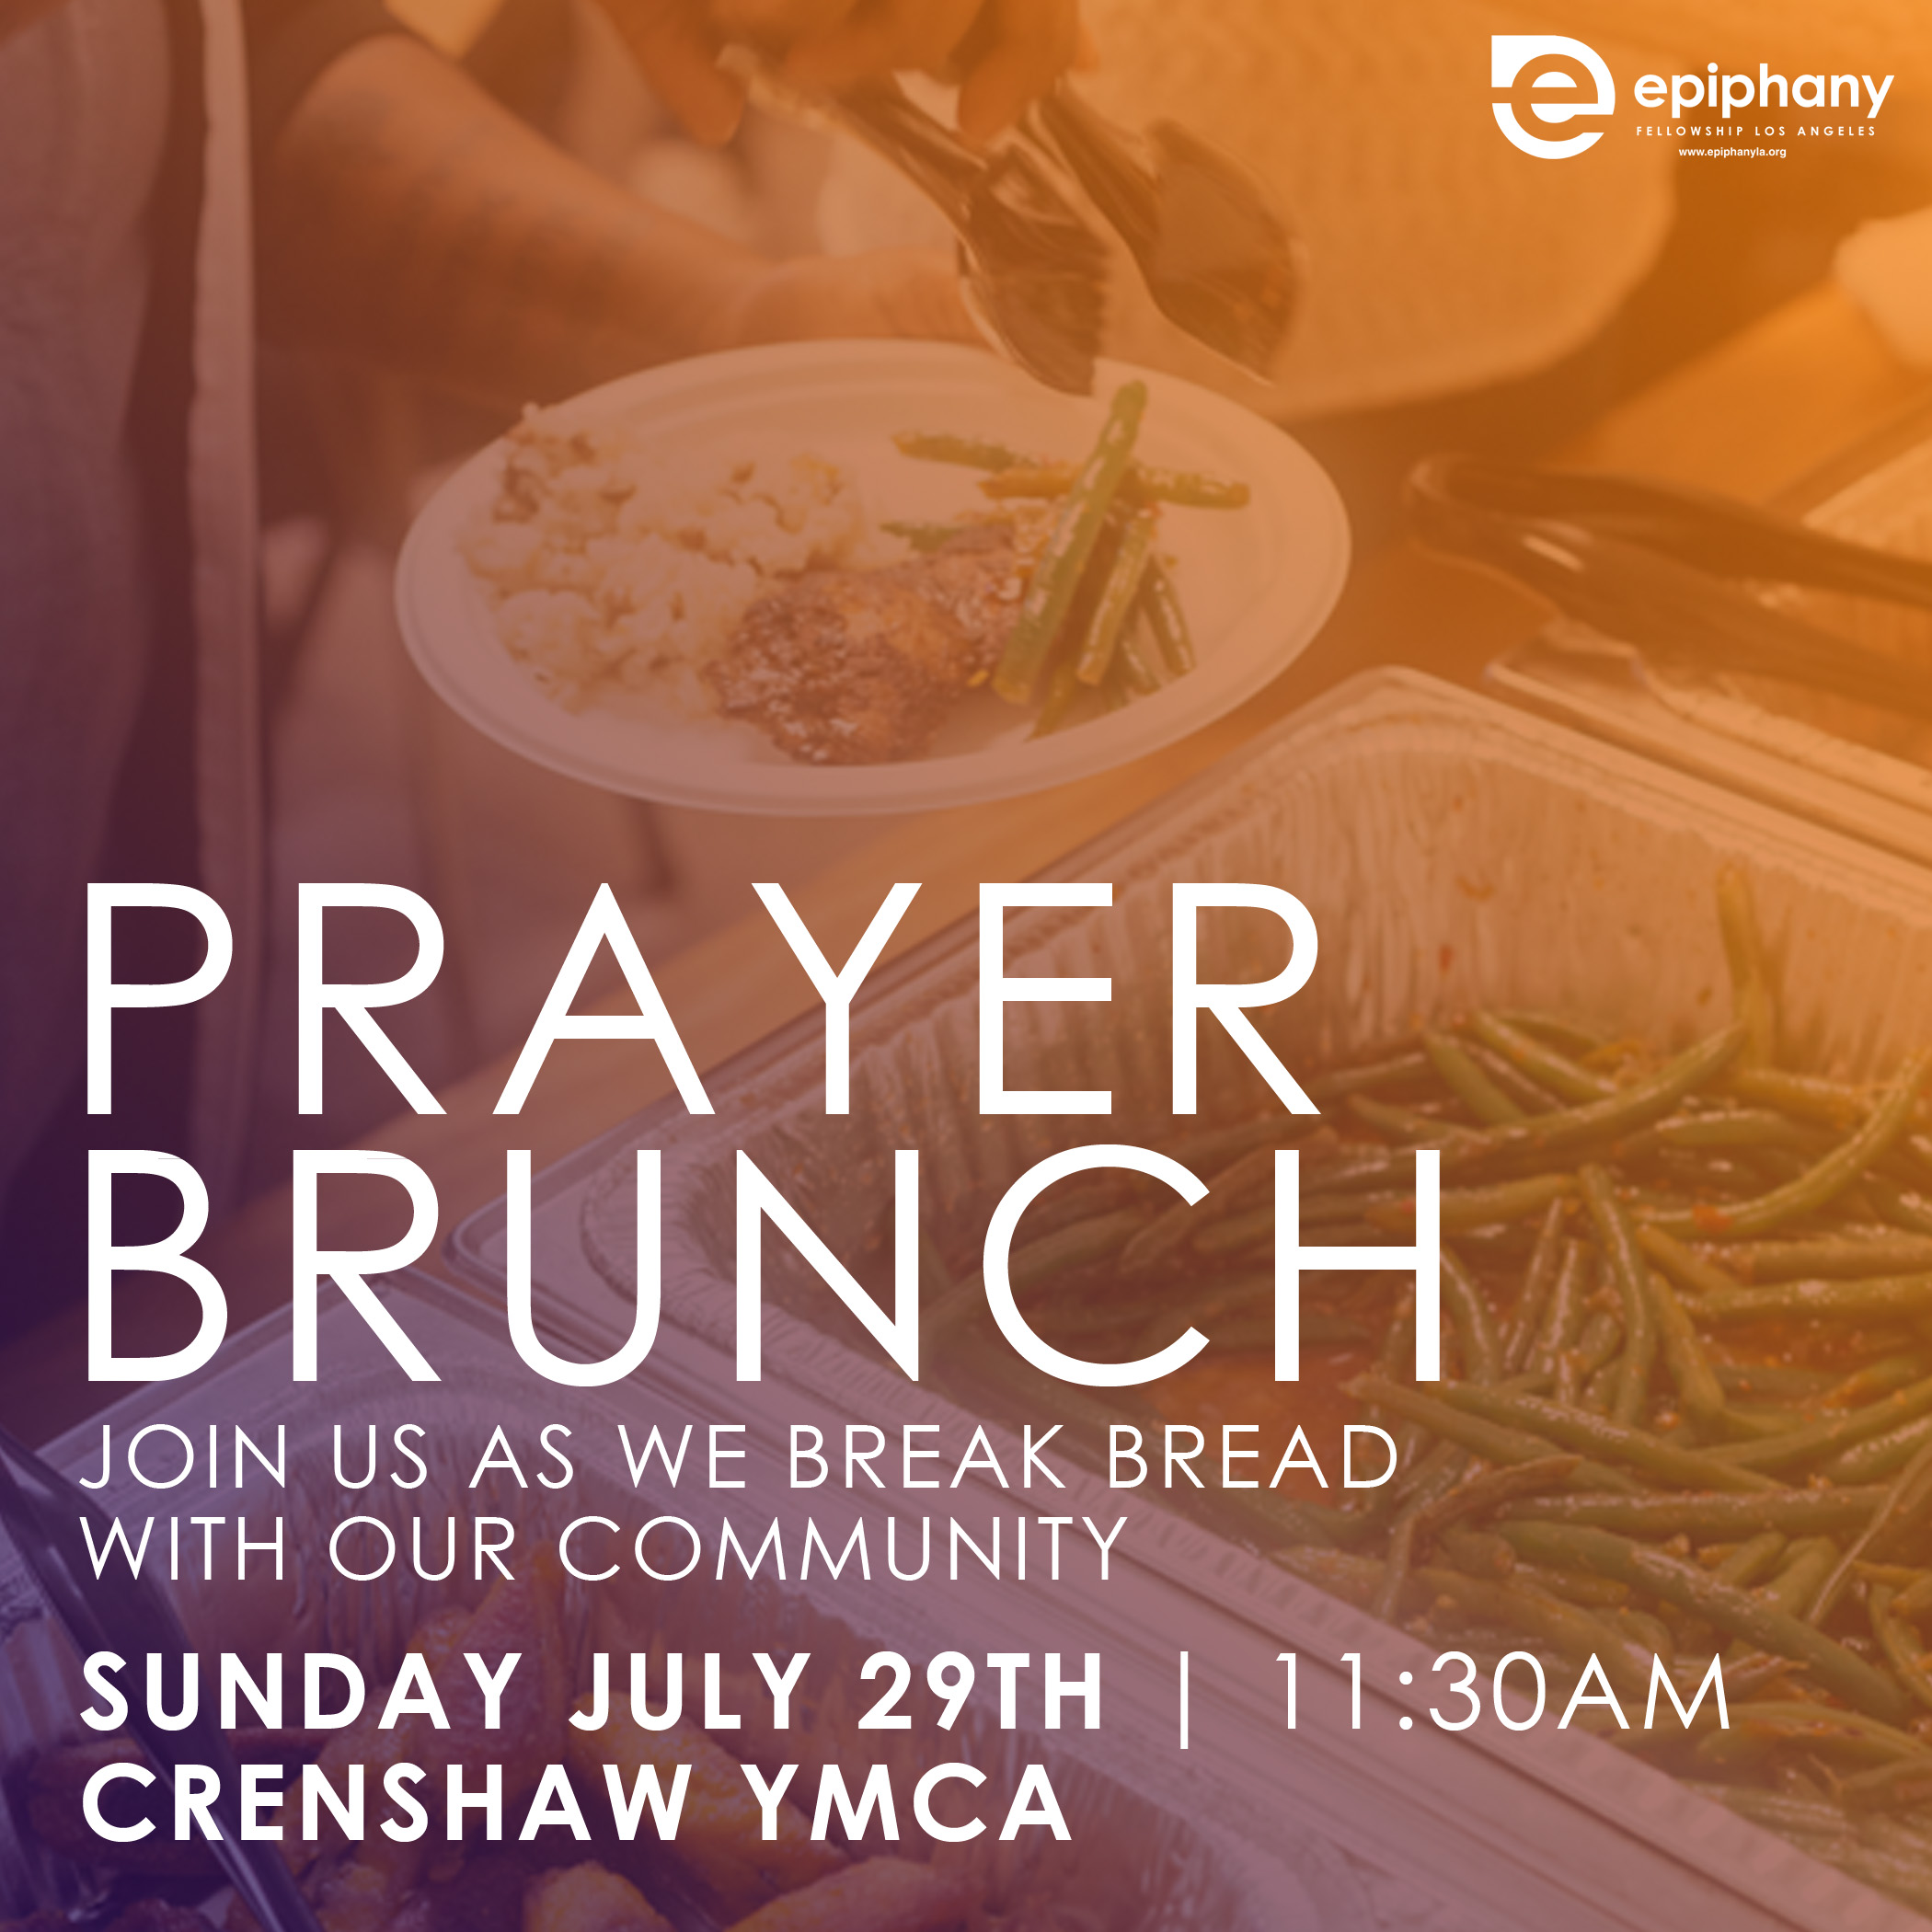 Epiphany_PrayerBreakfast_sq